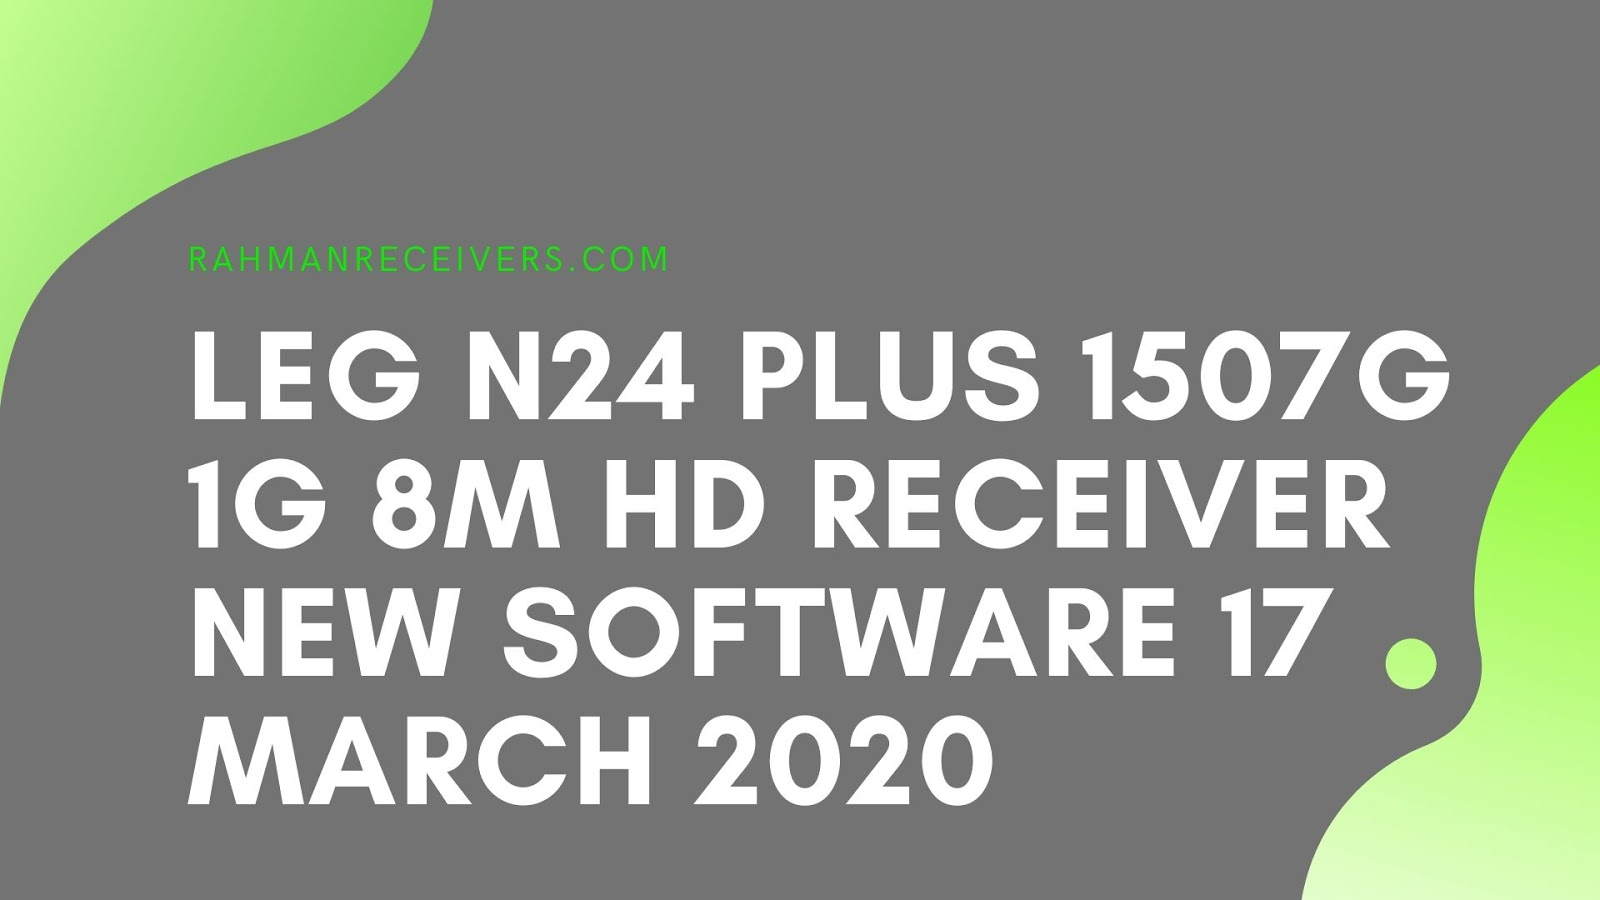 LEG N24 PLUS 1507G 1G 8M HD RECEIVER NEW SOFTWARE 17 MARCH 2020